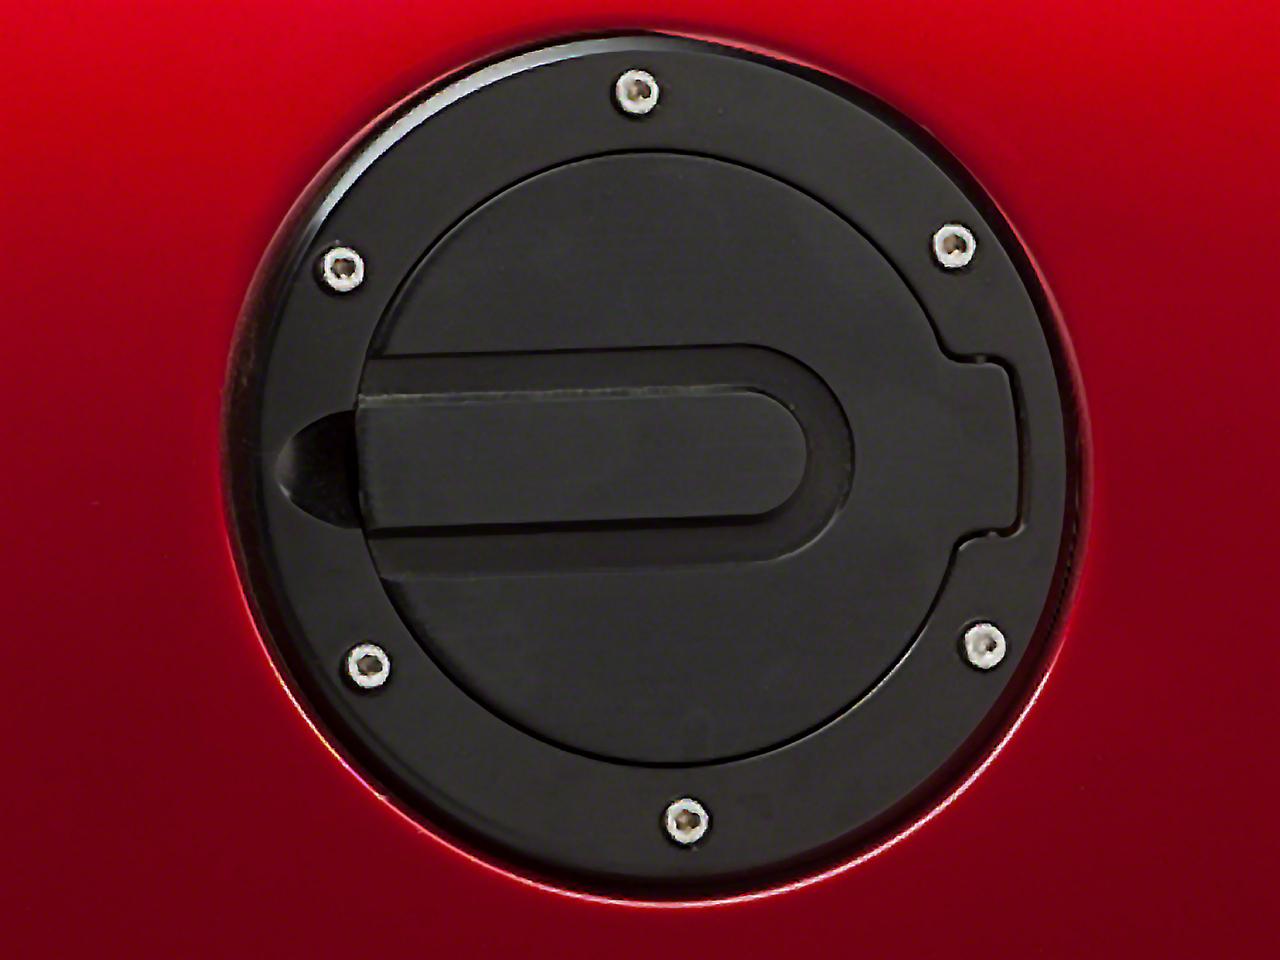 SHR Black Fuel Door (94-04 All)